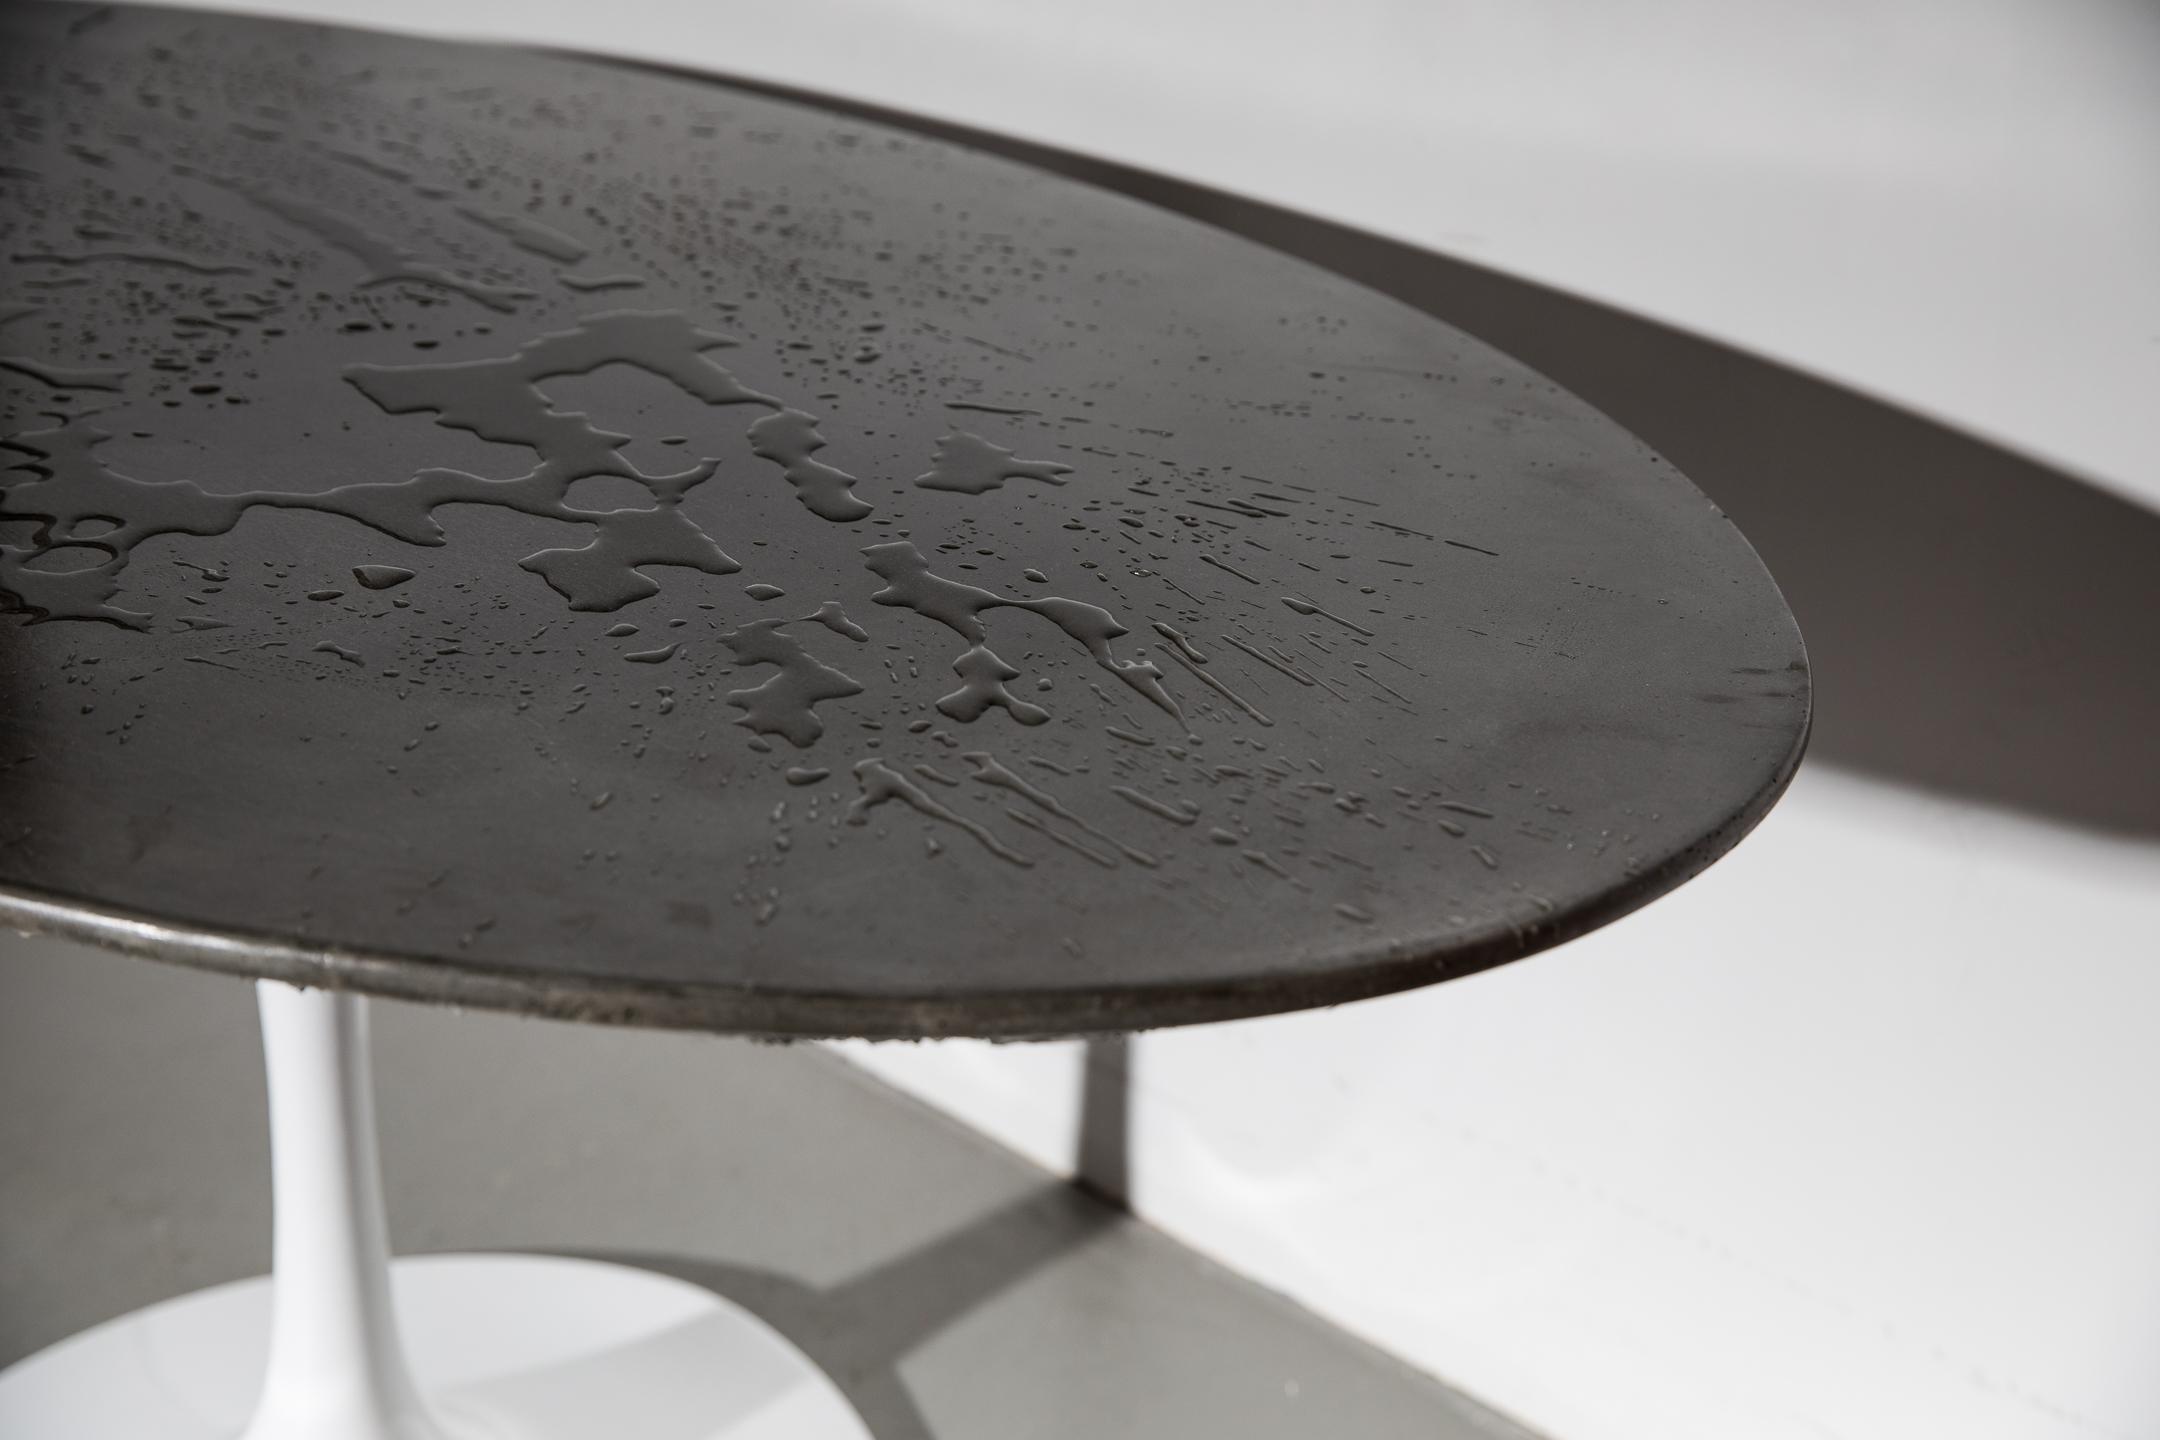 3_Patrick Cain Designs_Harvey Concrete Tulip Table_Cowhide.jpg